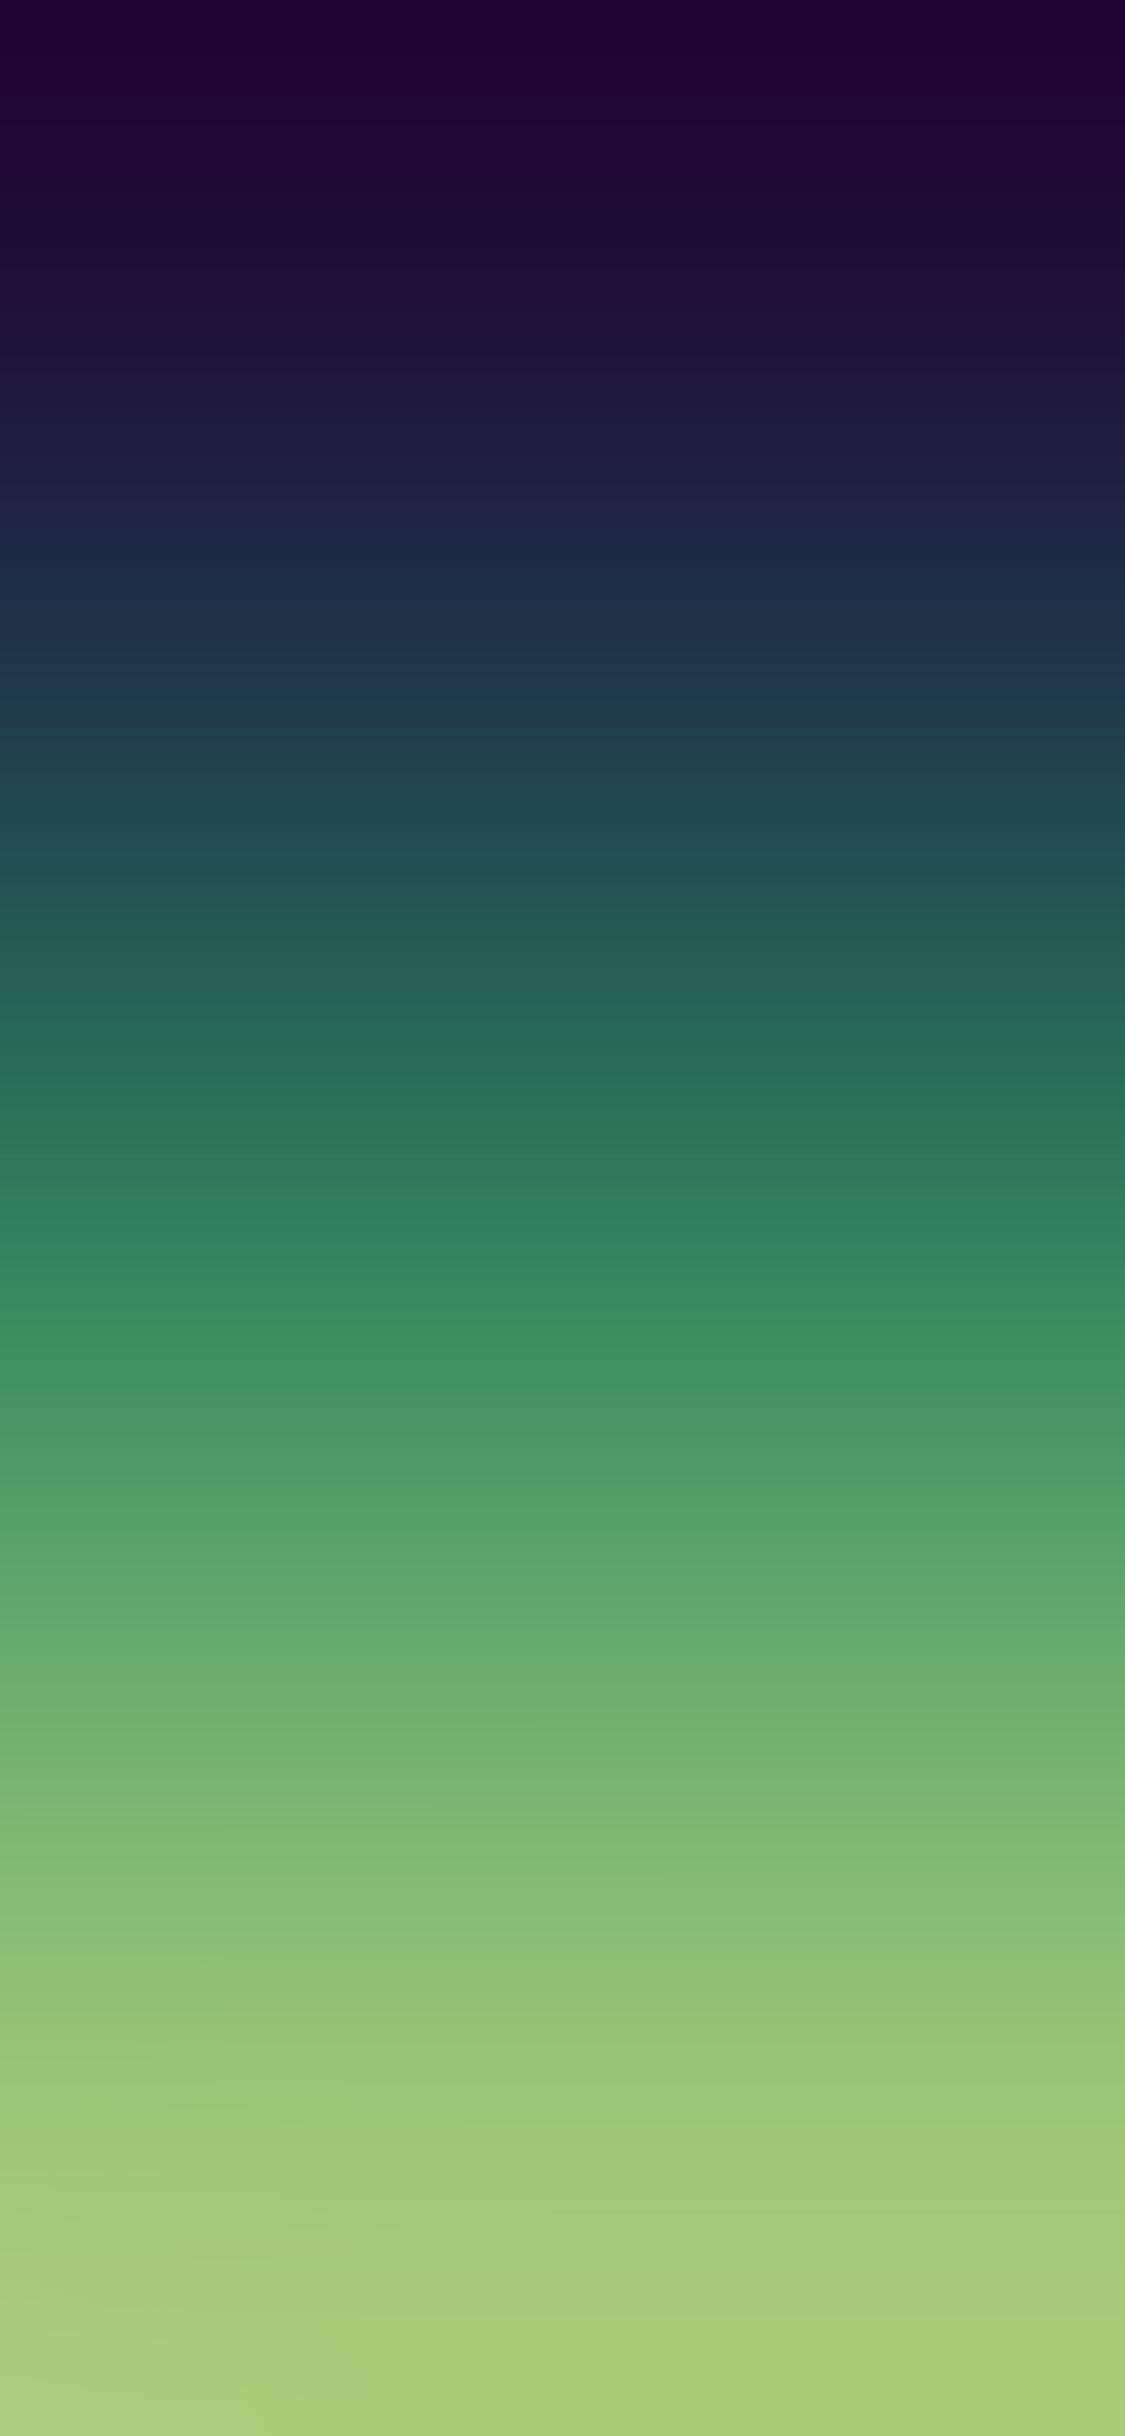 iPhonexpapers.com-Apple-iPhone-wallpaper-sm82-blue-green-soft-blur-gradation